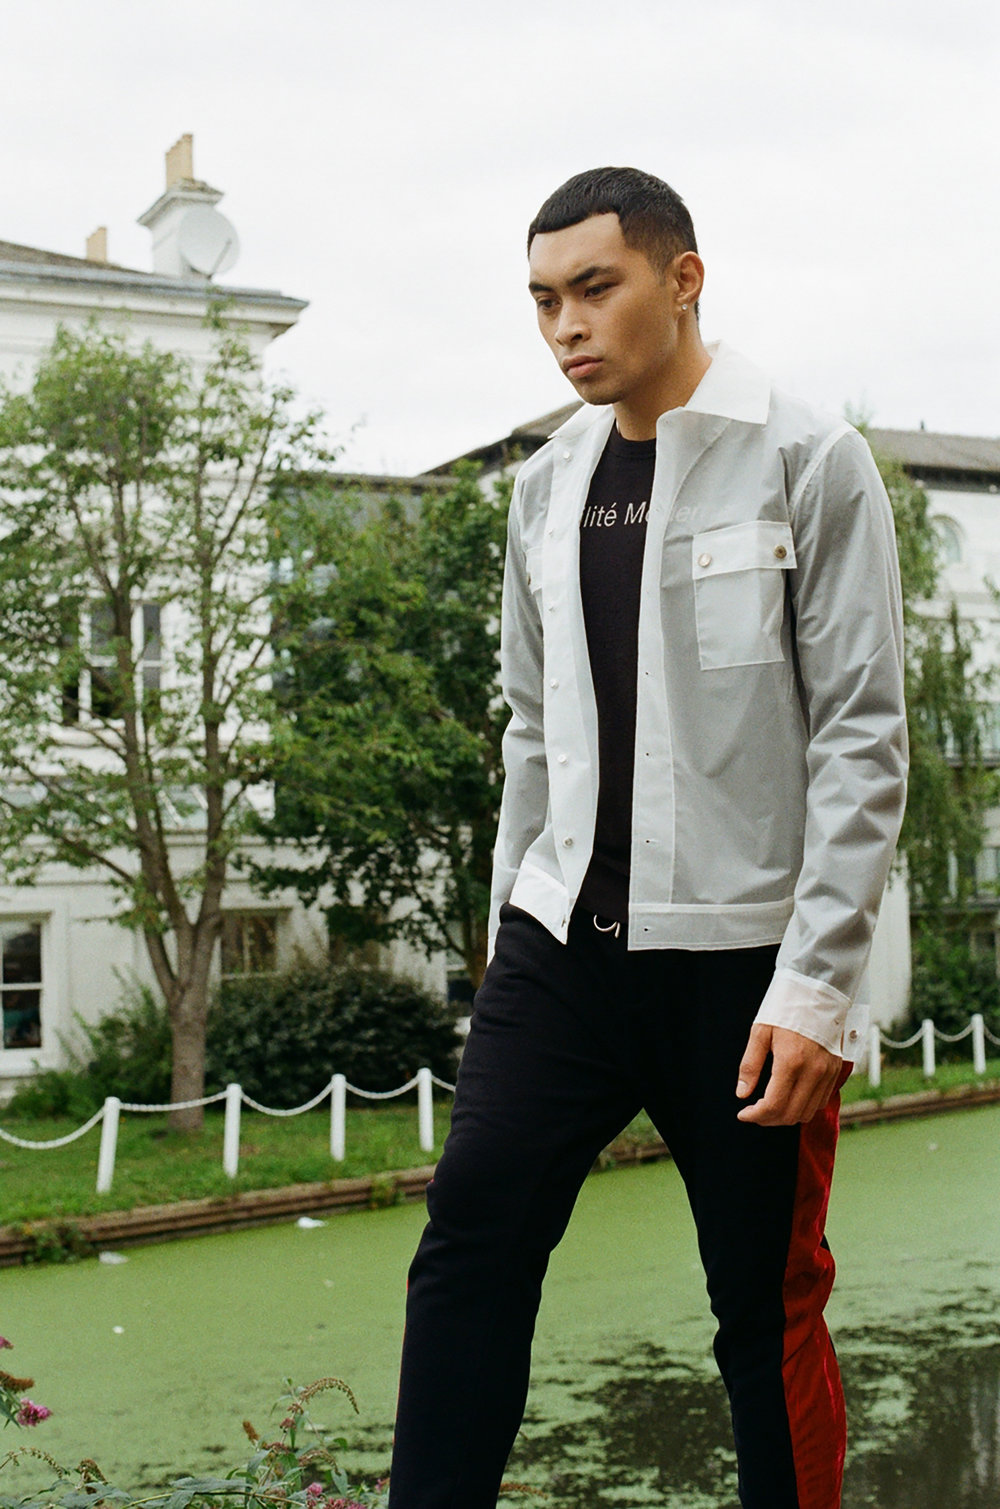 Rainier wears: Jacket - Weekday Stores, Jumper - Wood Wood, Trousers - Eastwood Danso